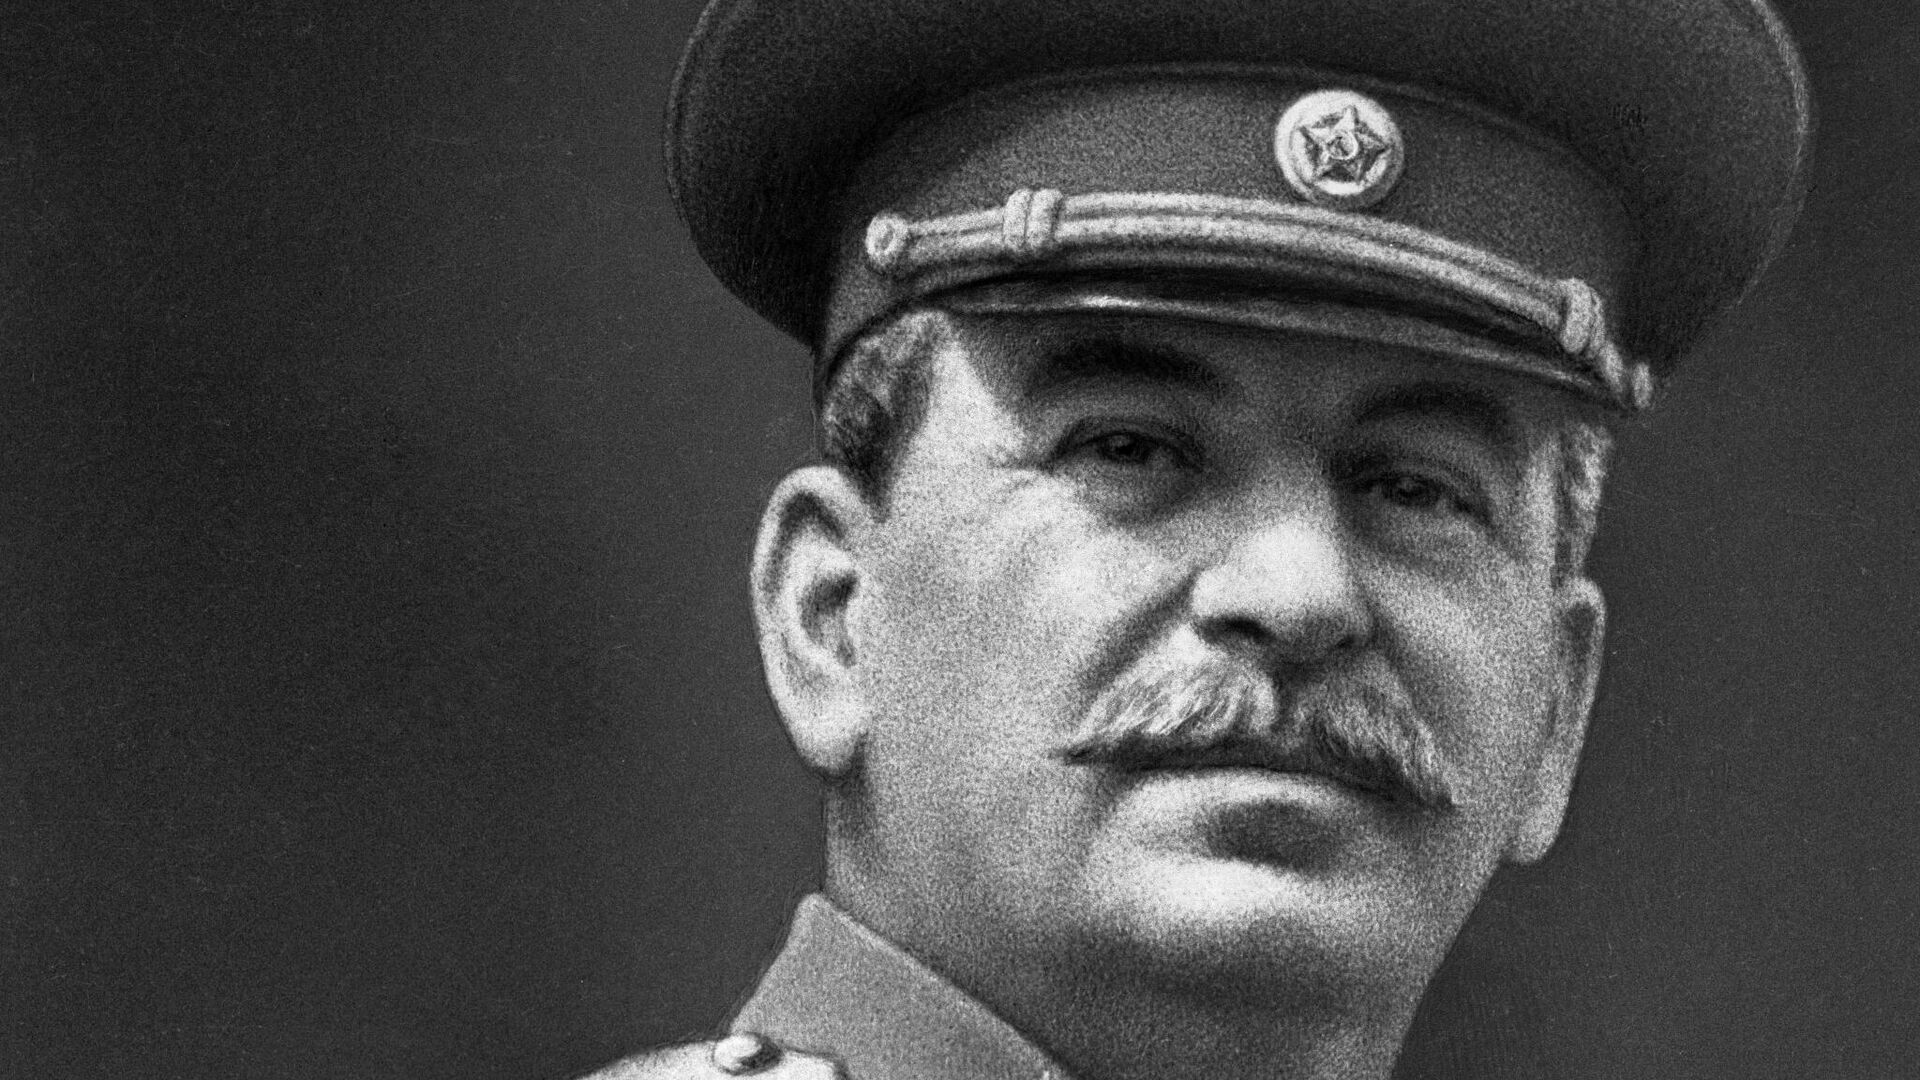 Генералиссимус Советского Союза Иосиф Виссарионович Сталин - РИА Новости, 1920, 26.11.2020